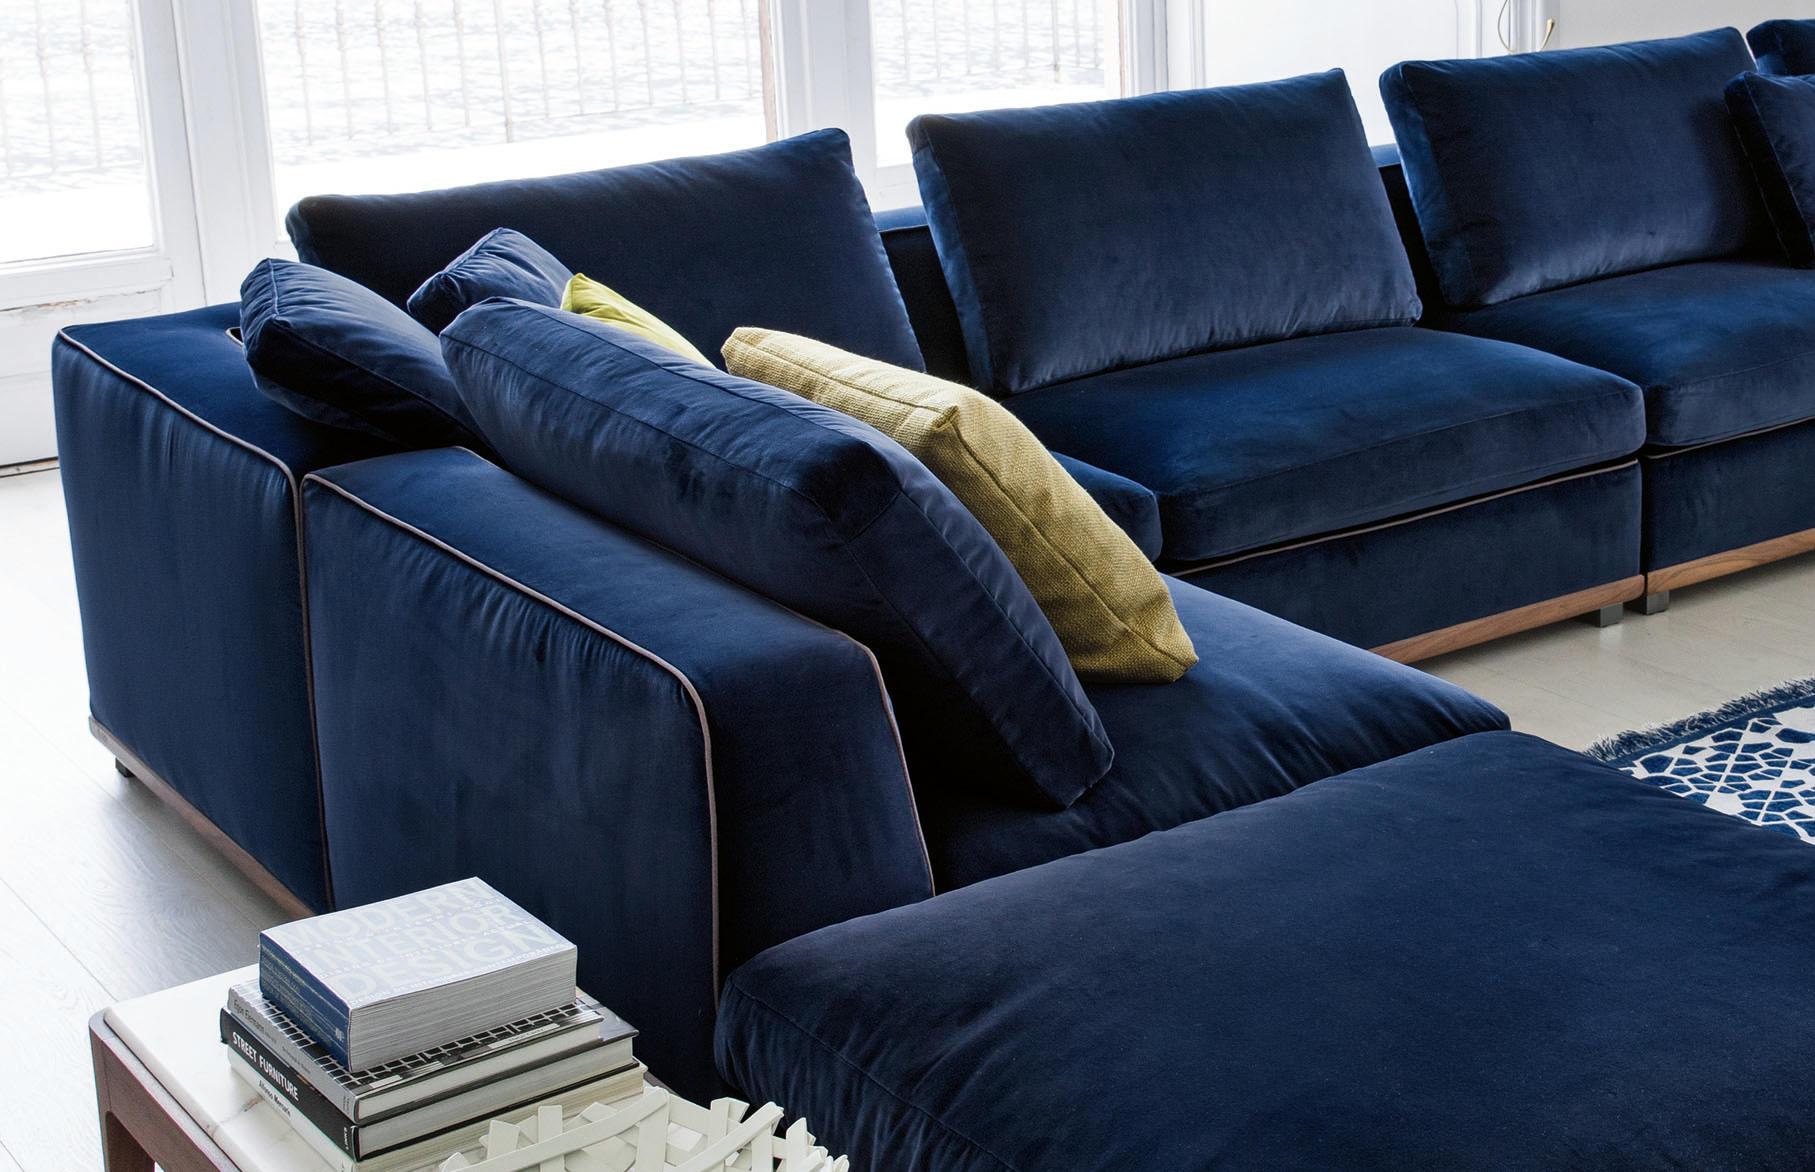 kirk sofas von porada architonic. Black Bedroom Furniture Sets. Home Design Ideas